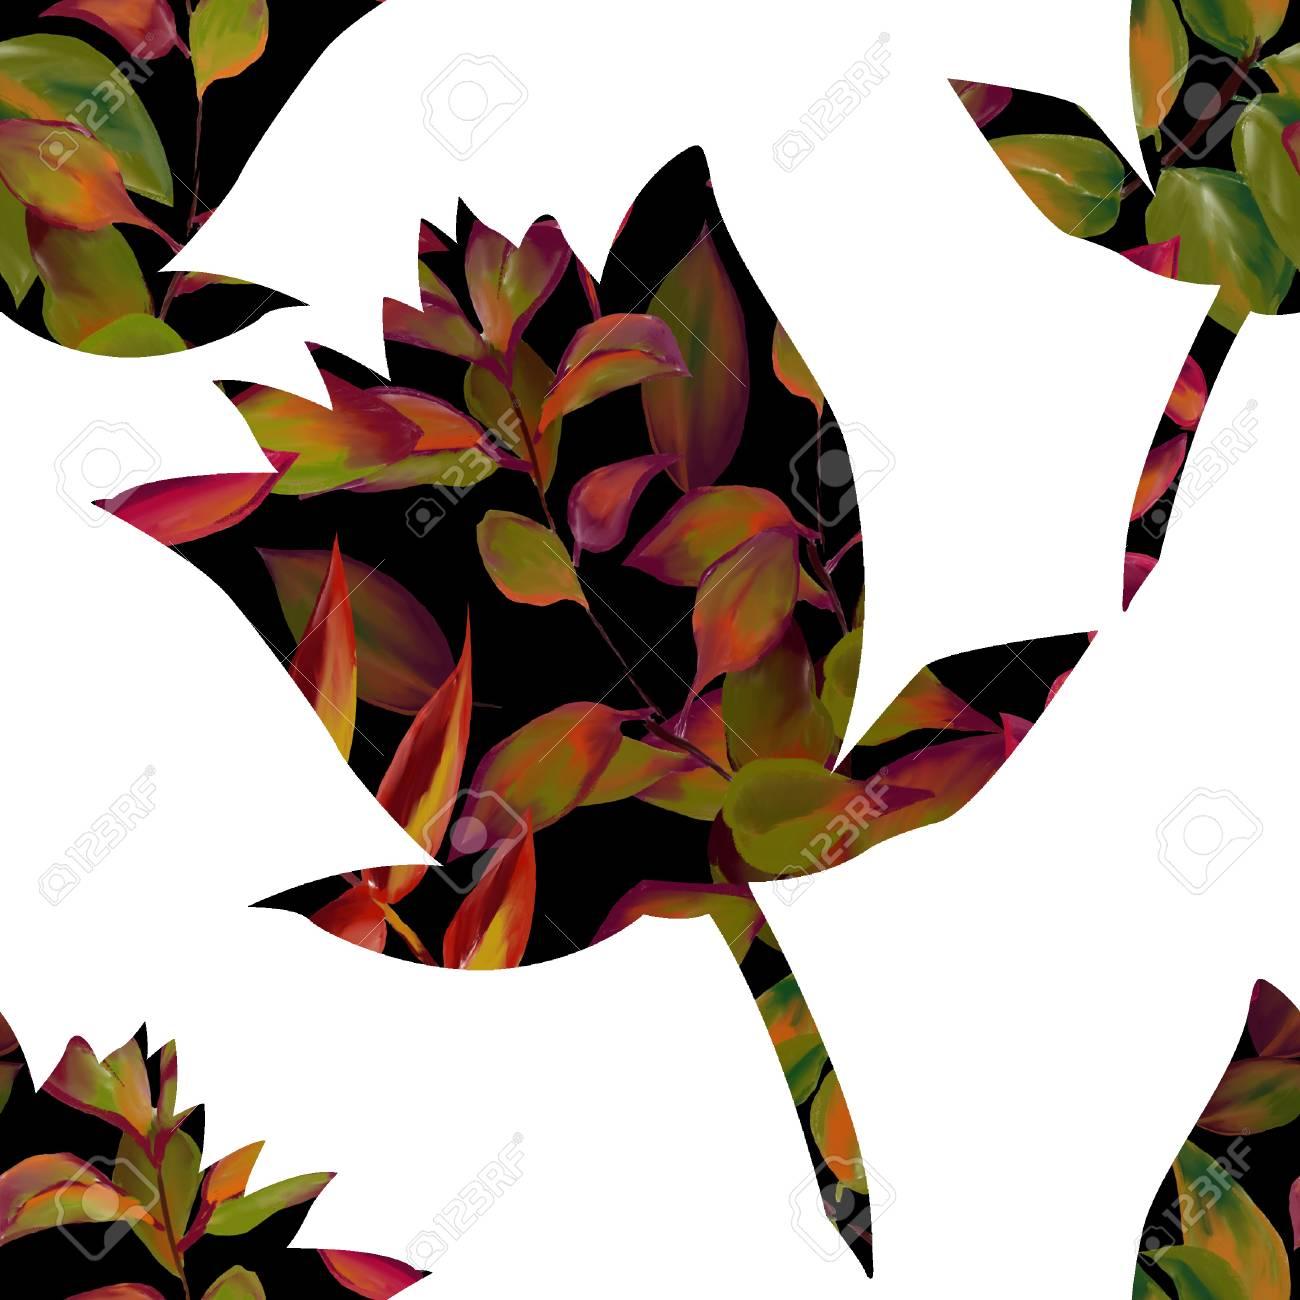 Seamless Pattern Flower Silhouette Indian Lotus Flowers Bright